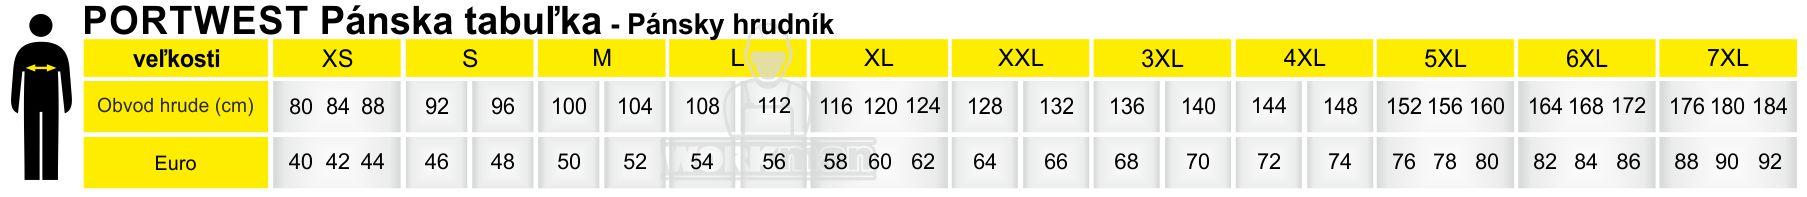 PORTWEST Pánska tabuľka - Pánsky hrudník